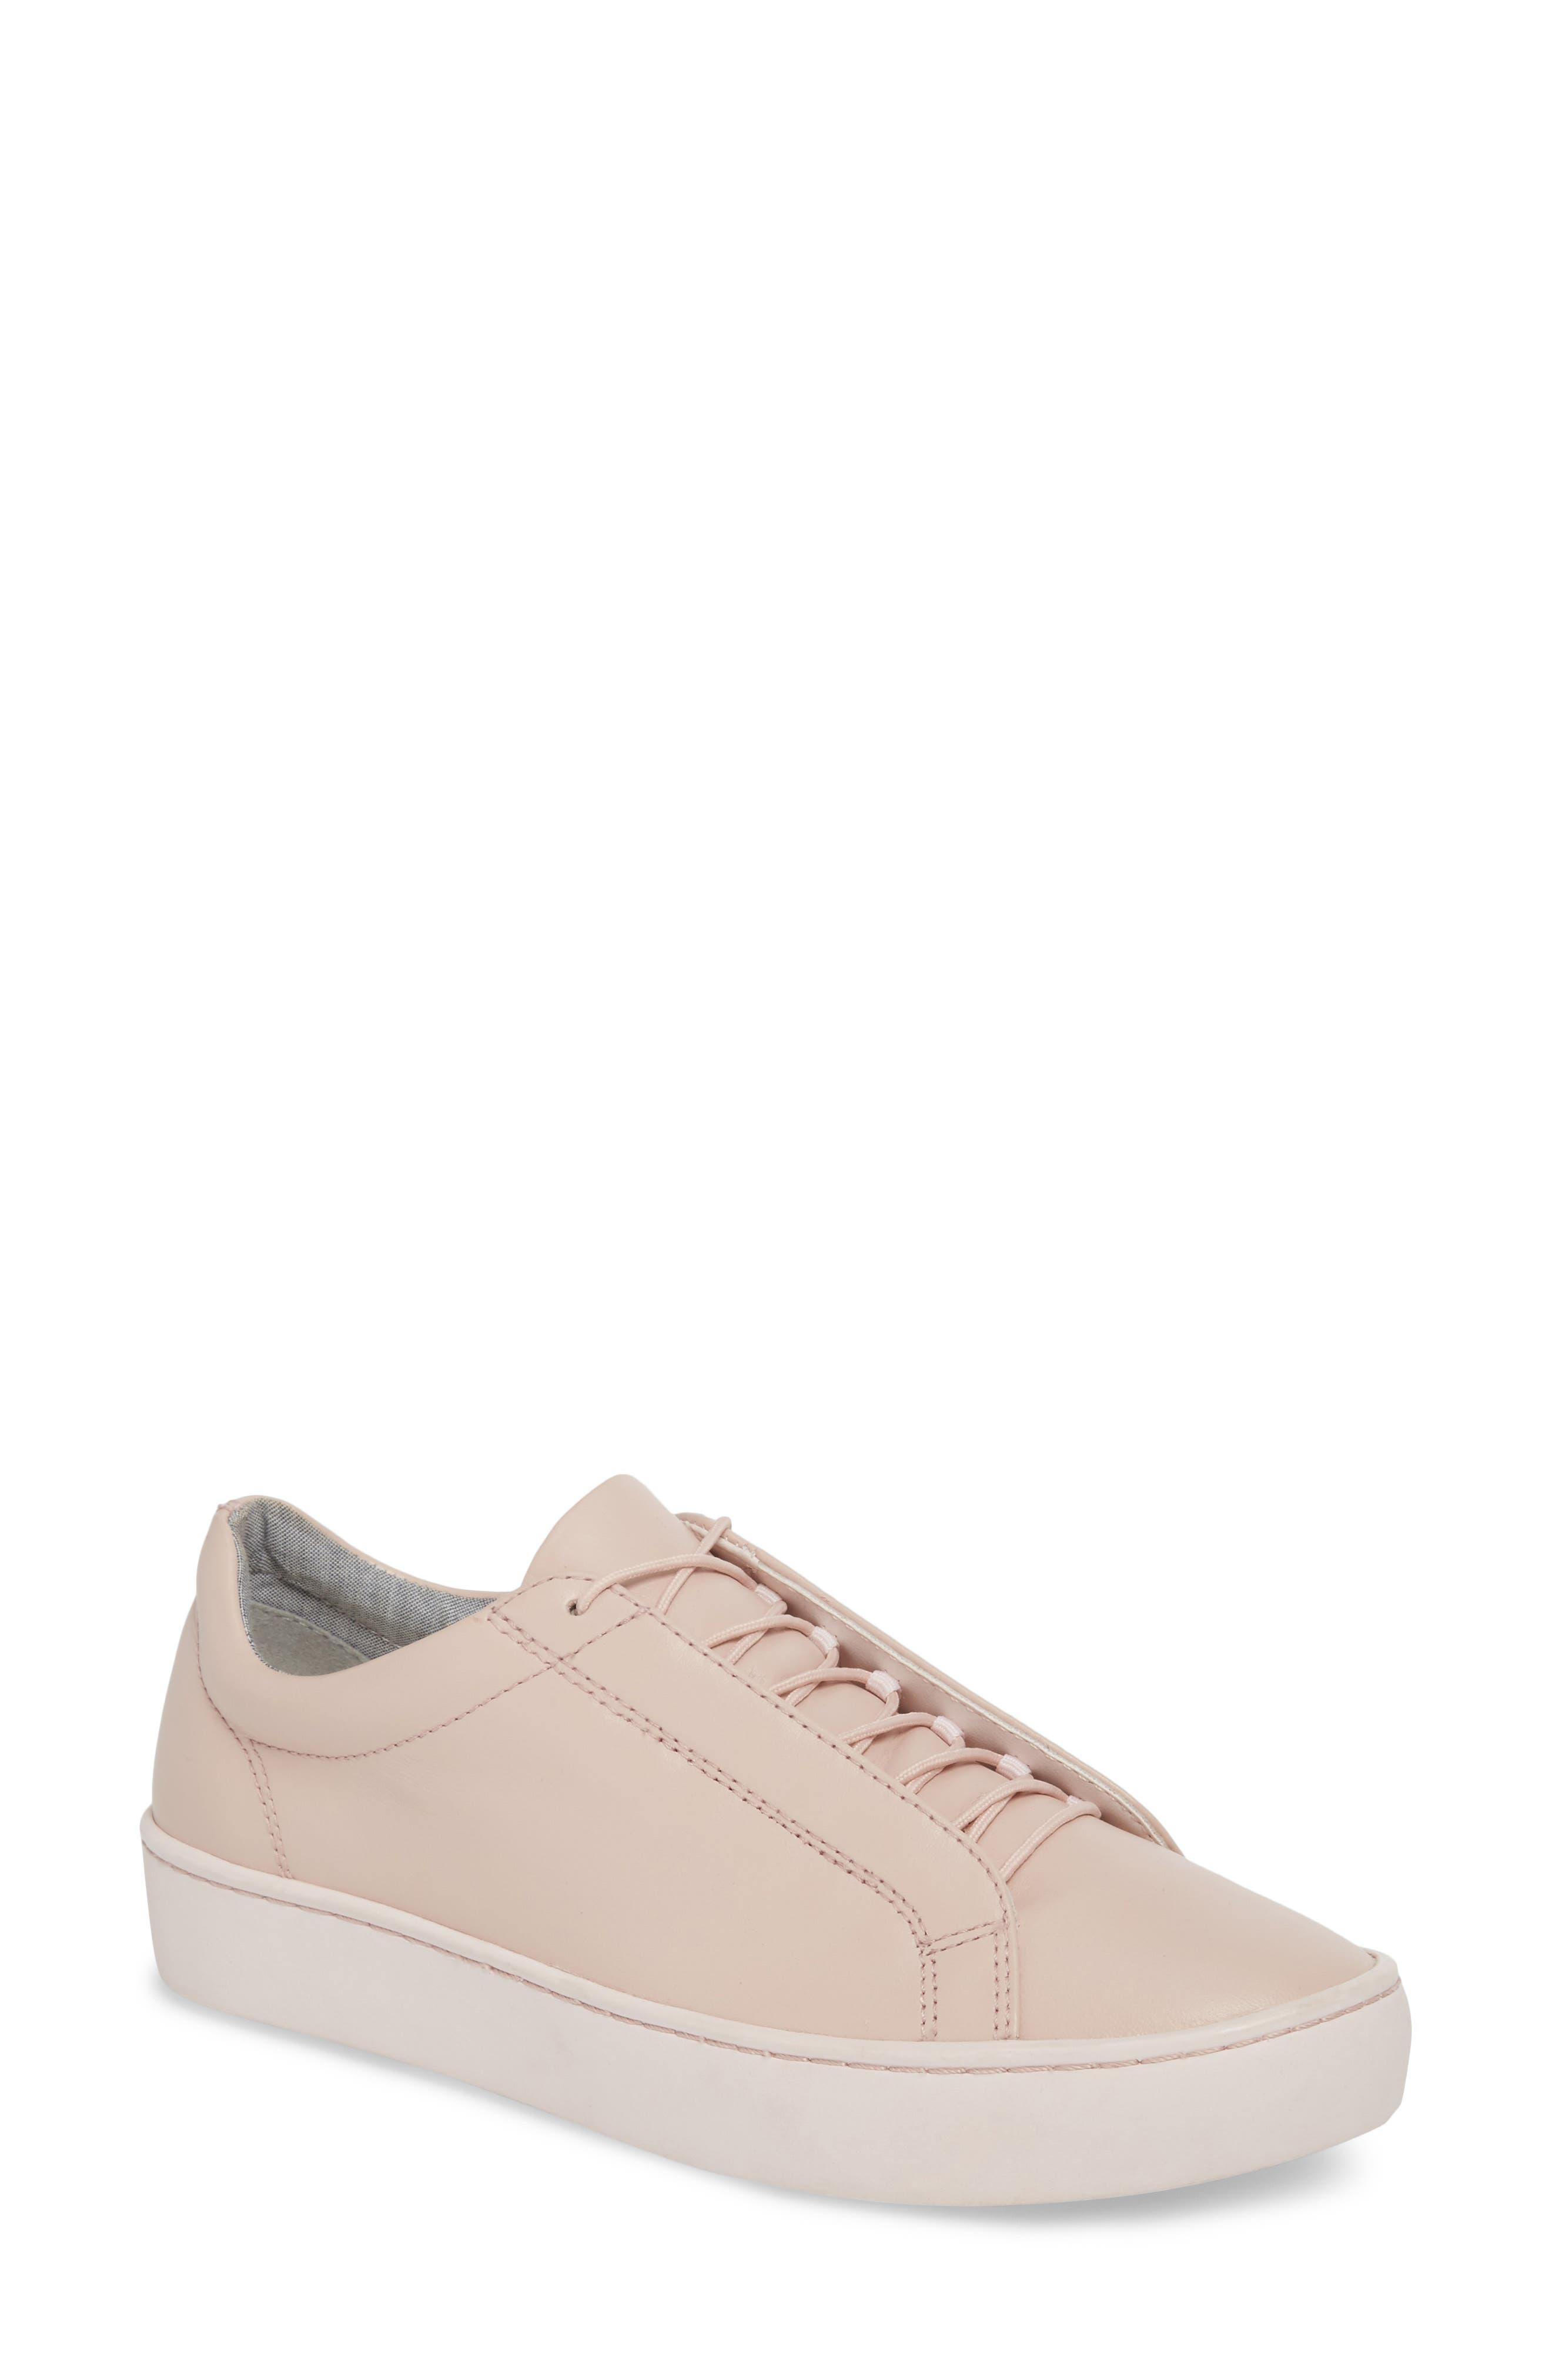 Zoe Sneaker,                             Main thumbnail 1, color,                             Milkshake Leather